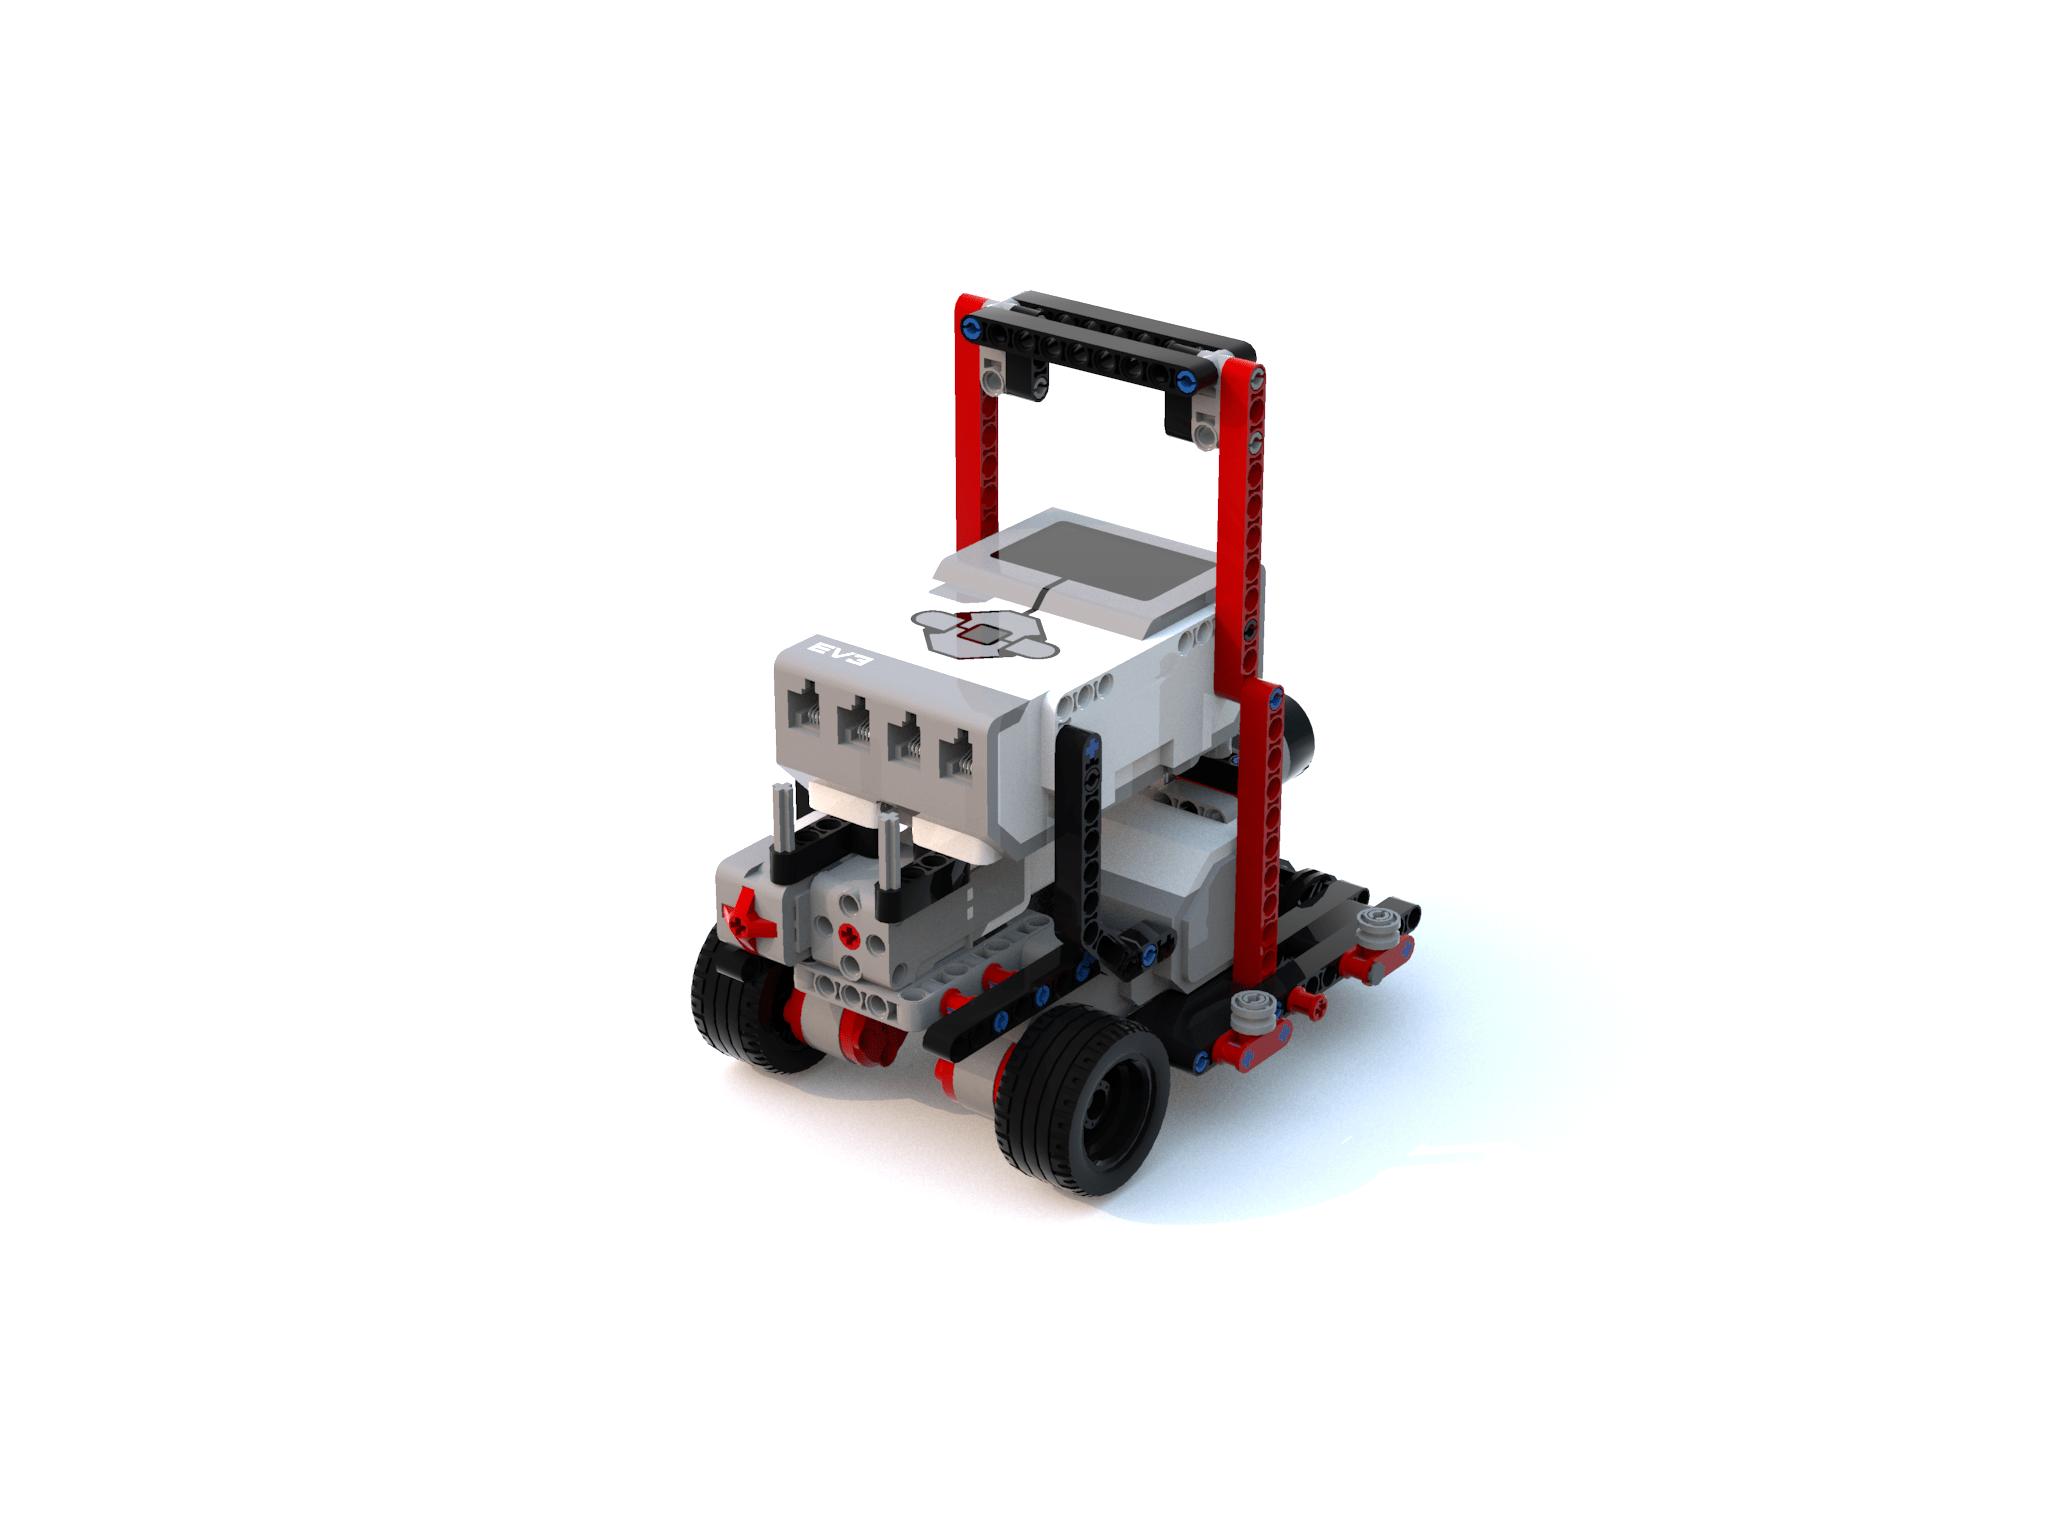 Robot Designs